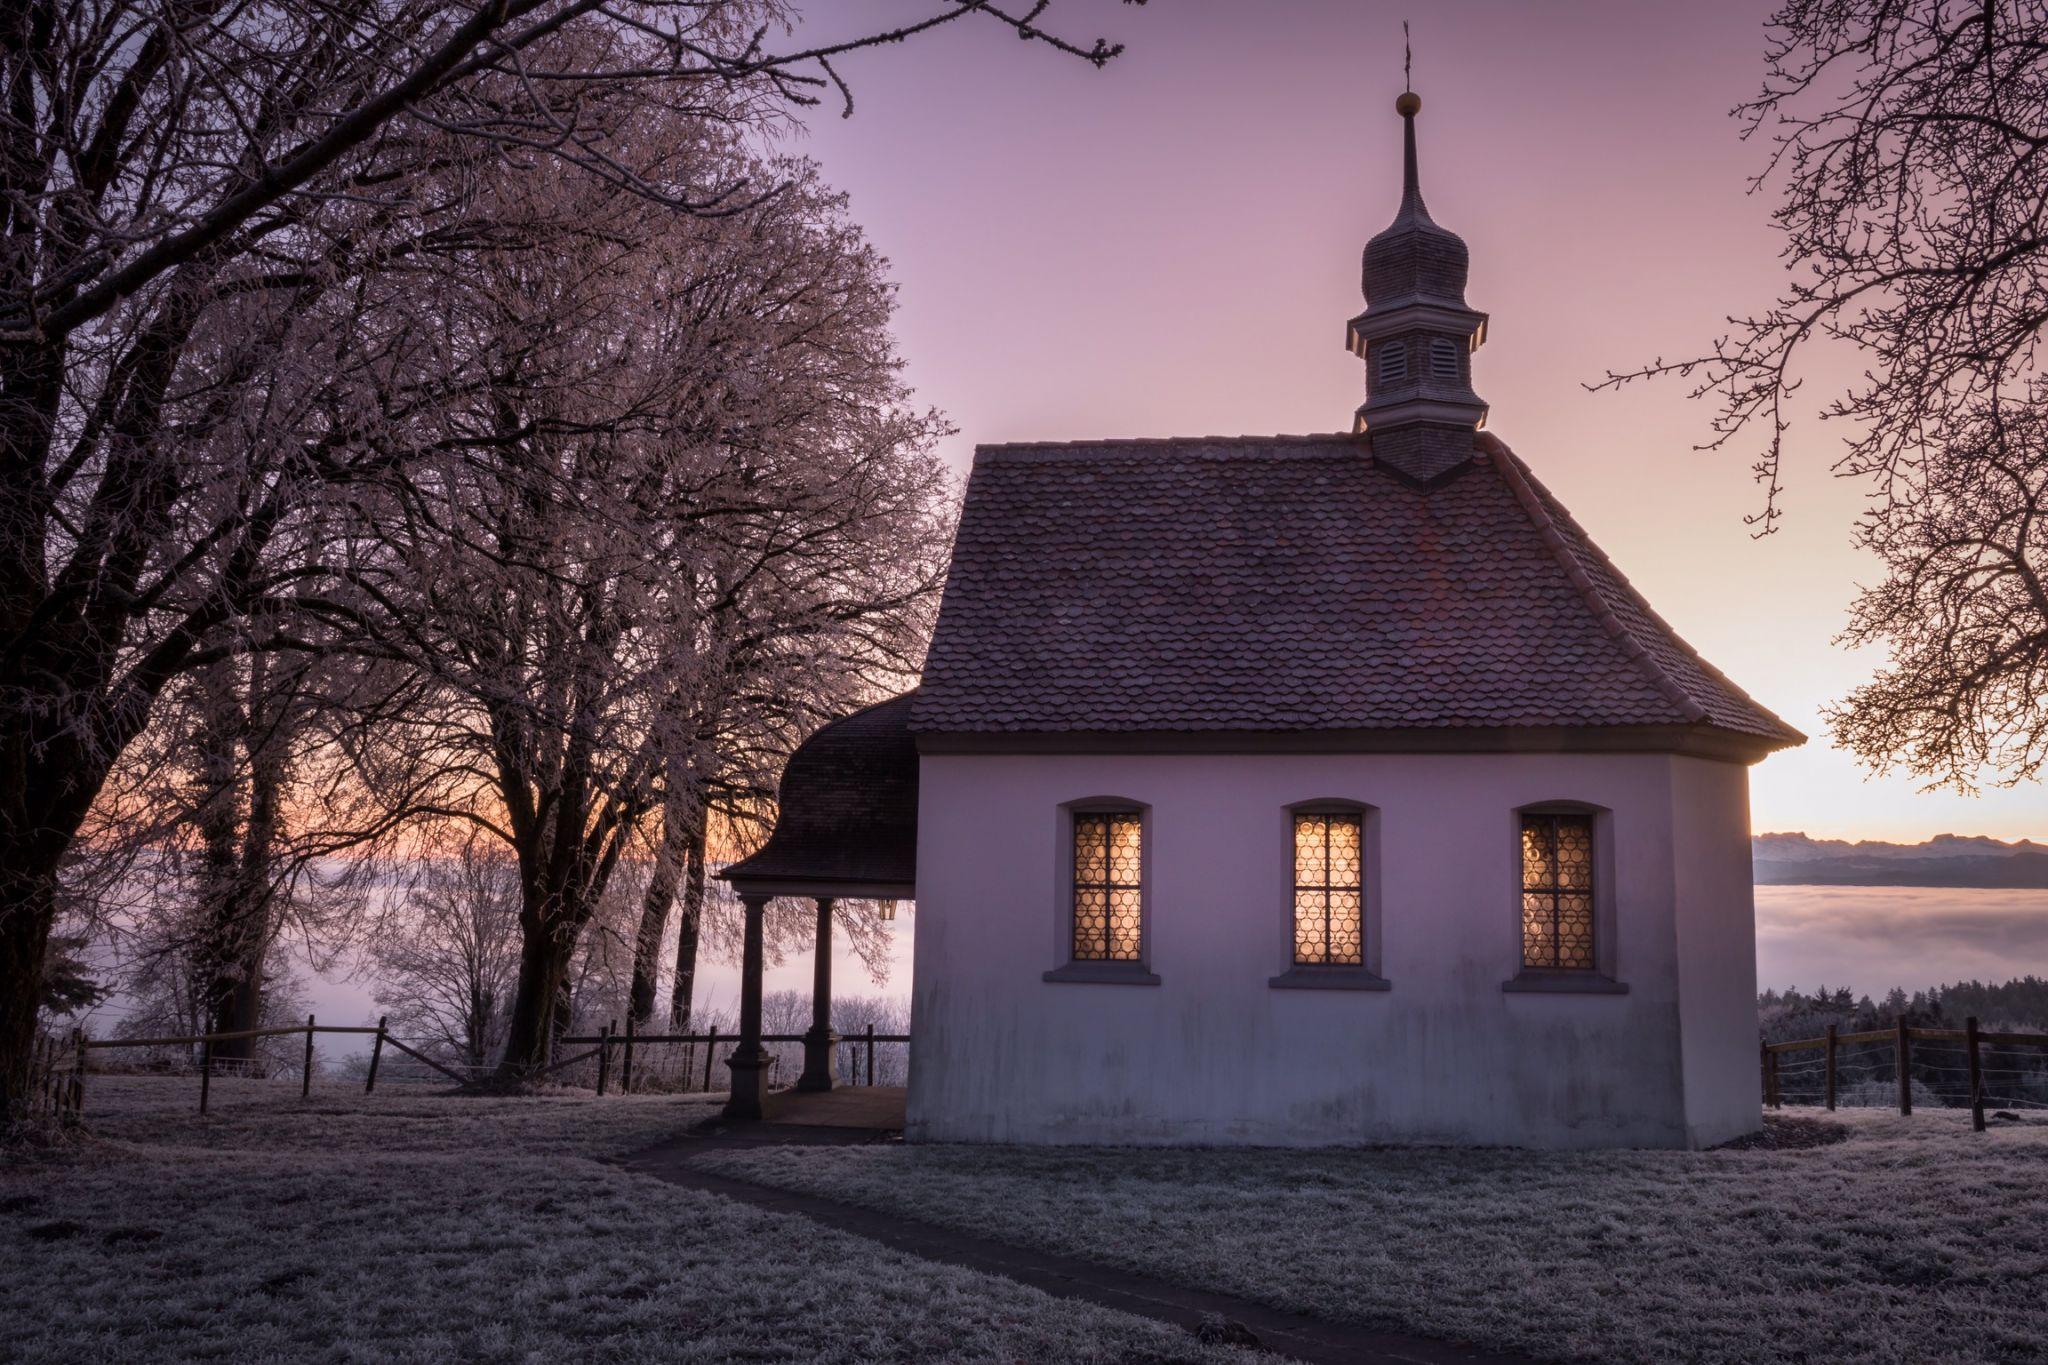 St. Wendelin Chapel, Switzerland